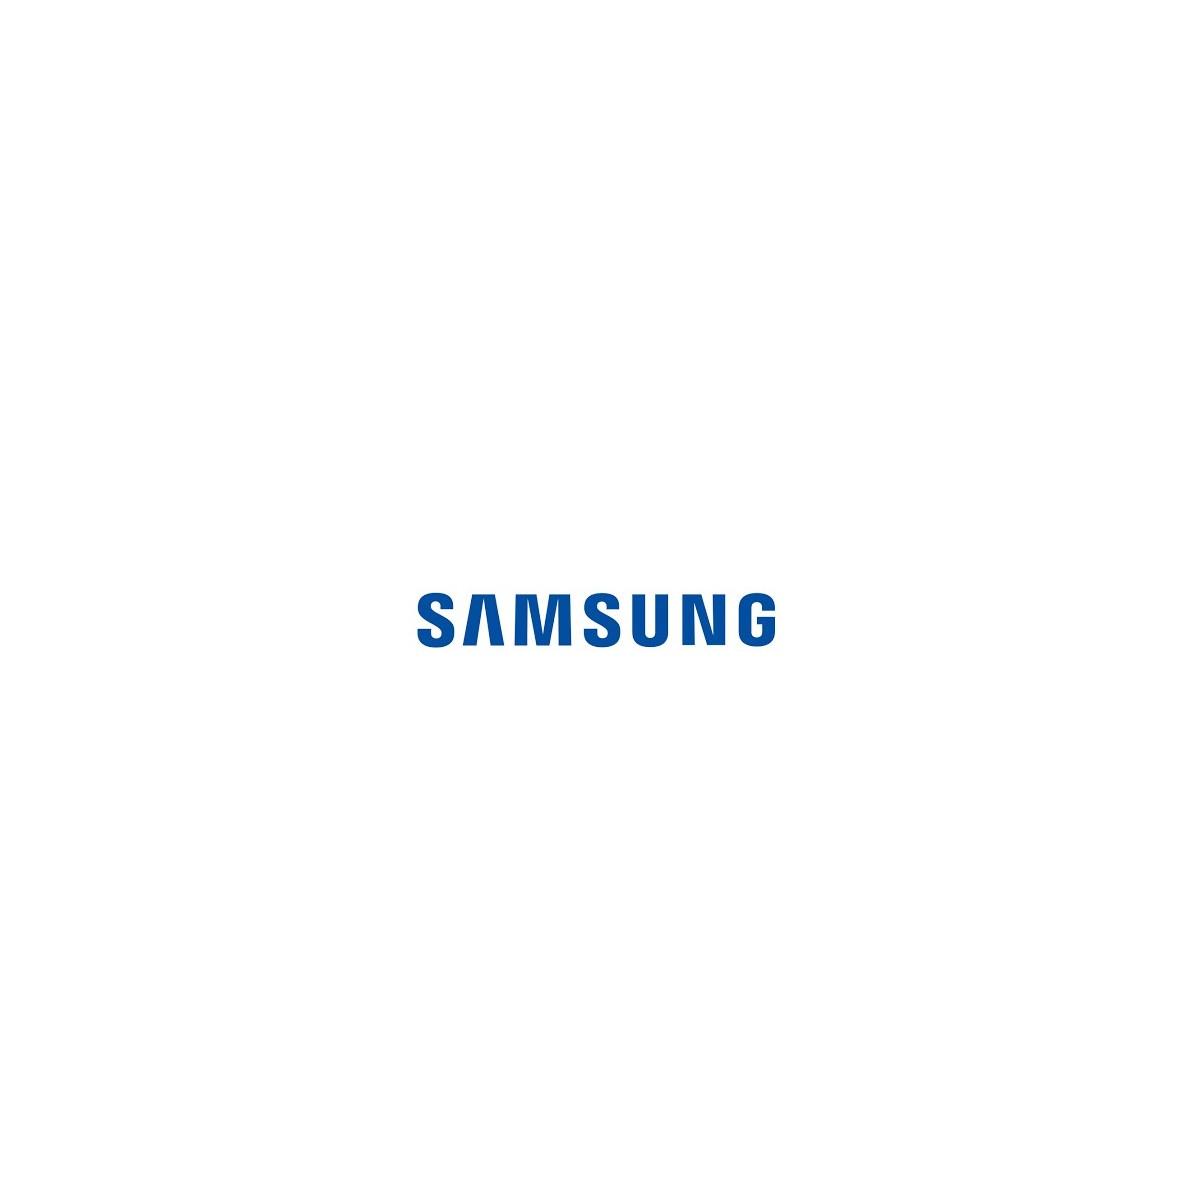 Licenza MGI Officeserv 7100 Samsung